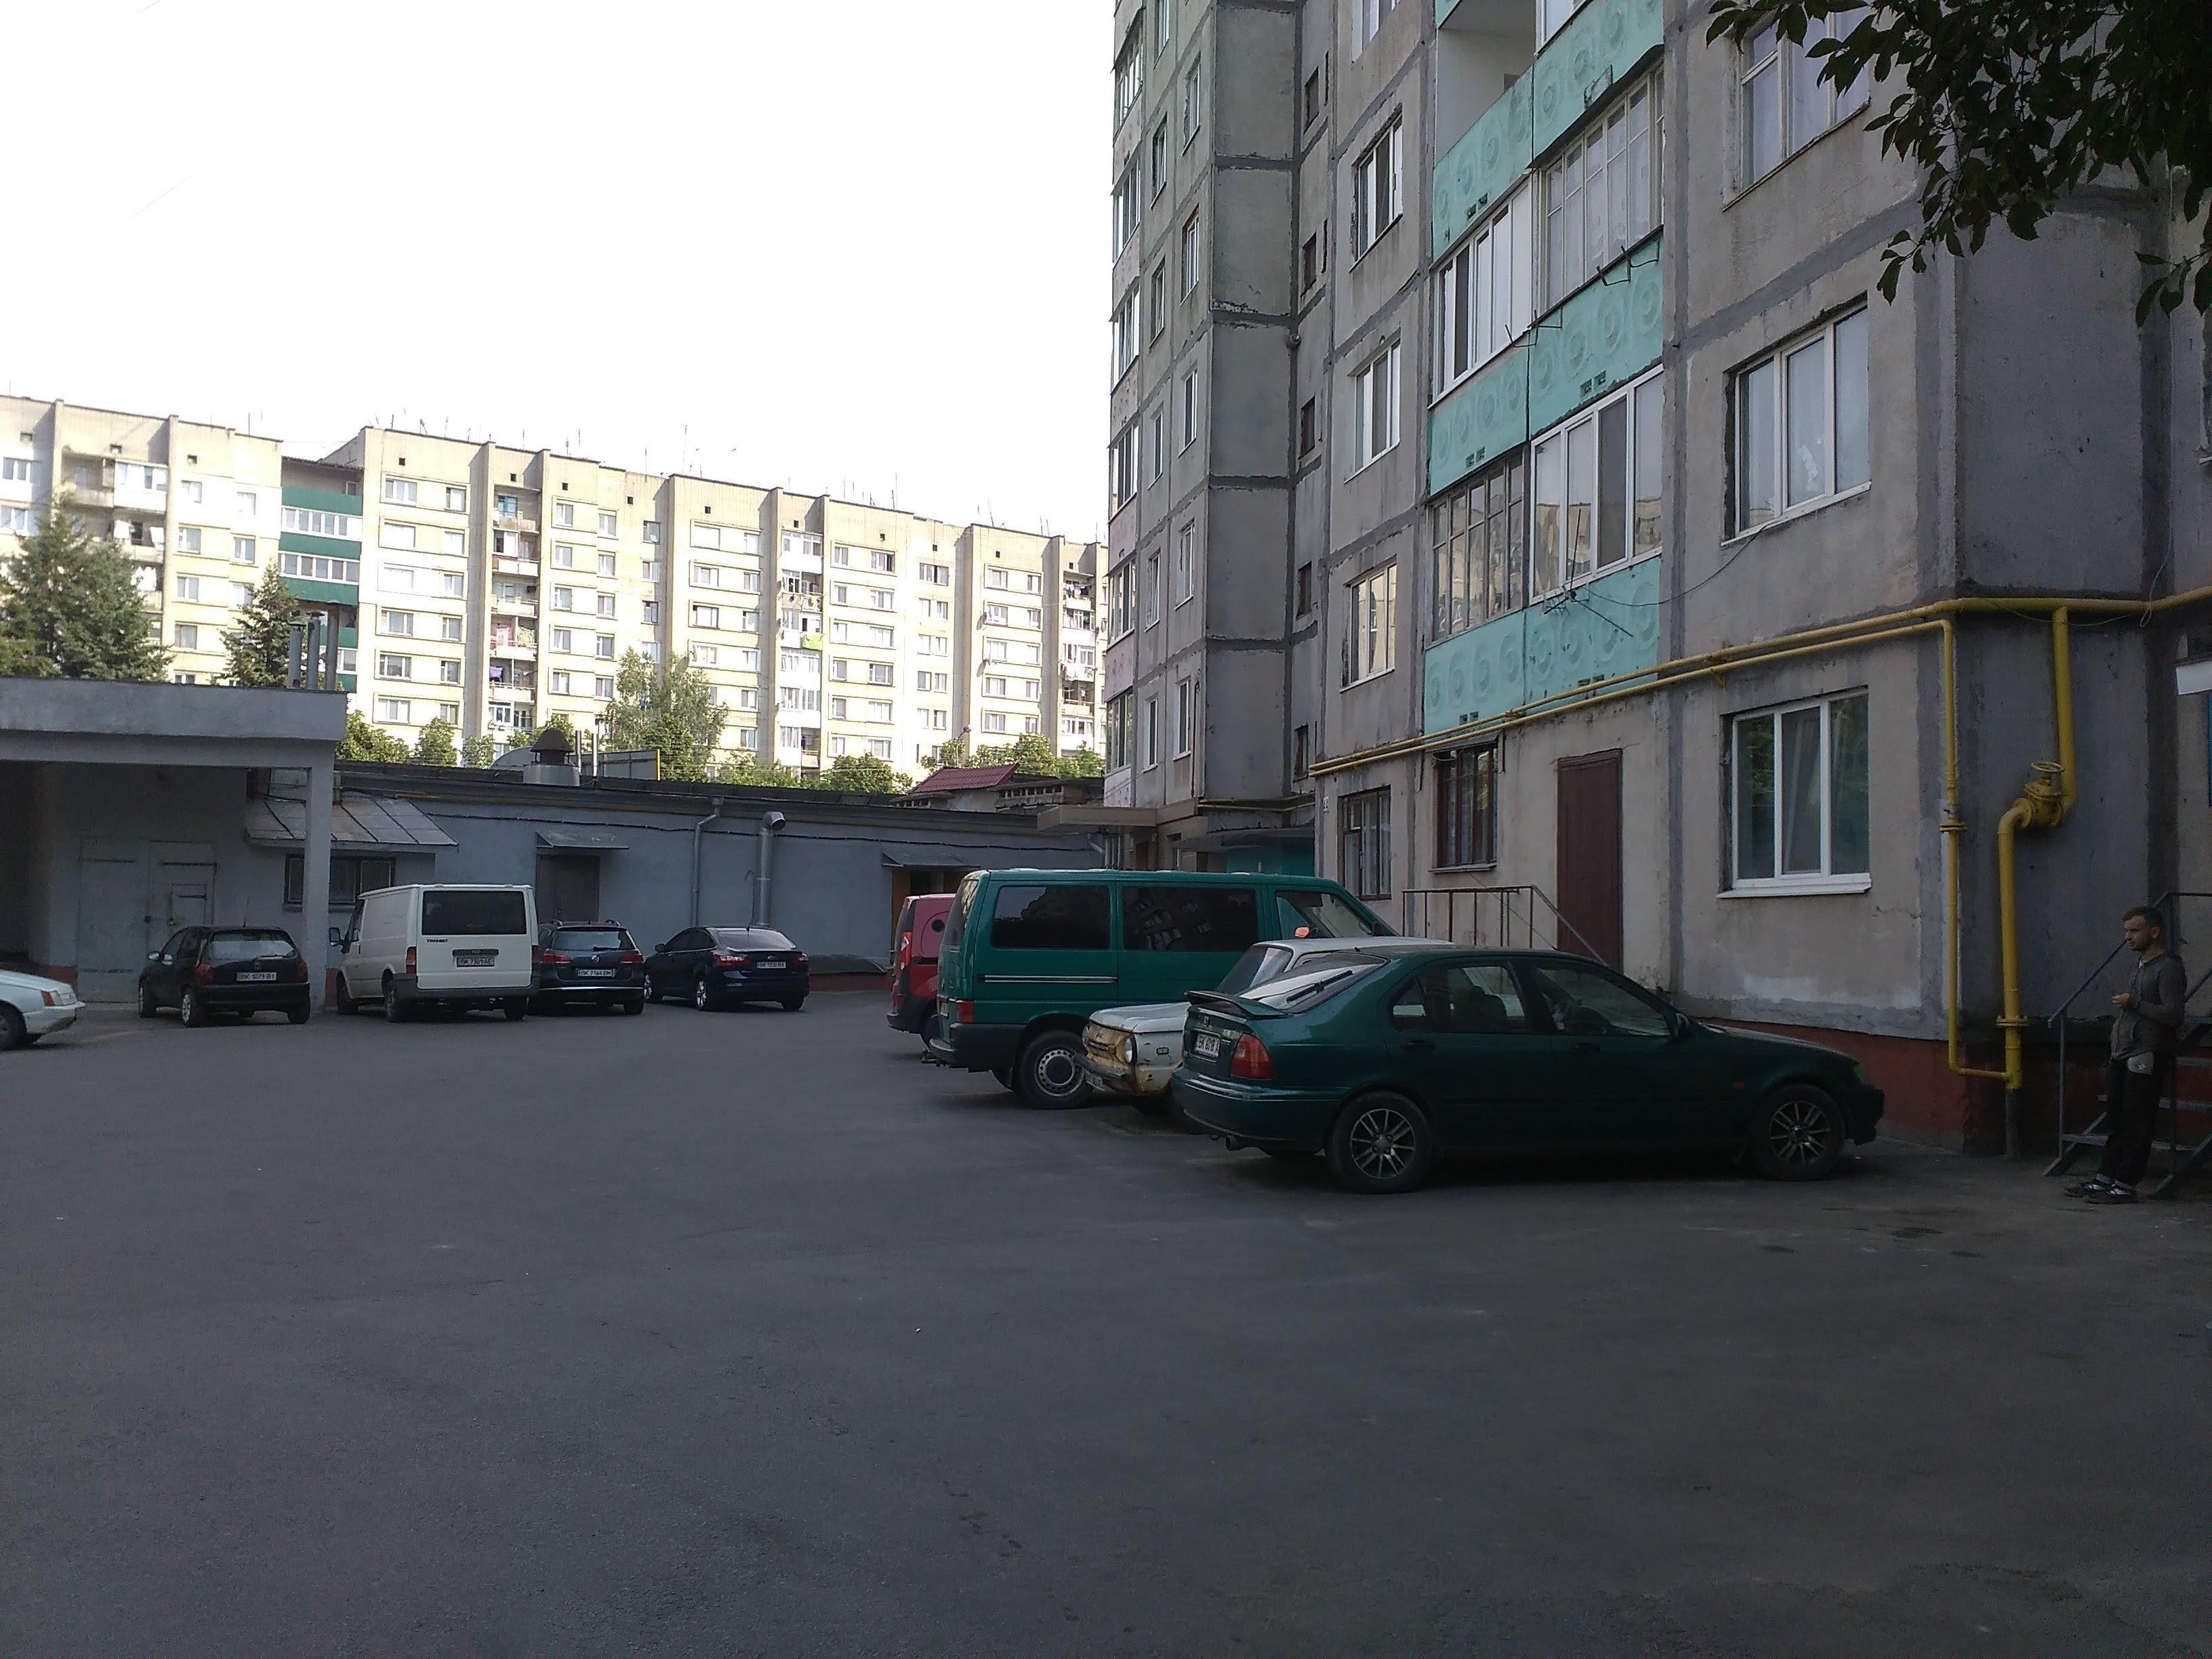 Sale flat in Адамовка. Announcement № 5854